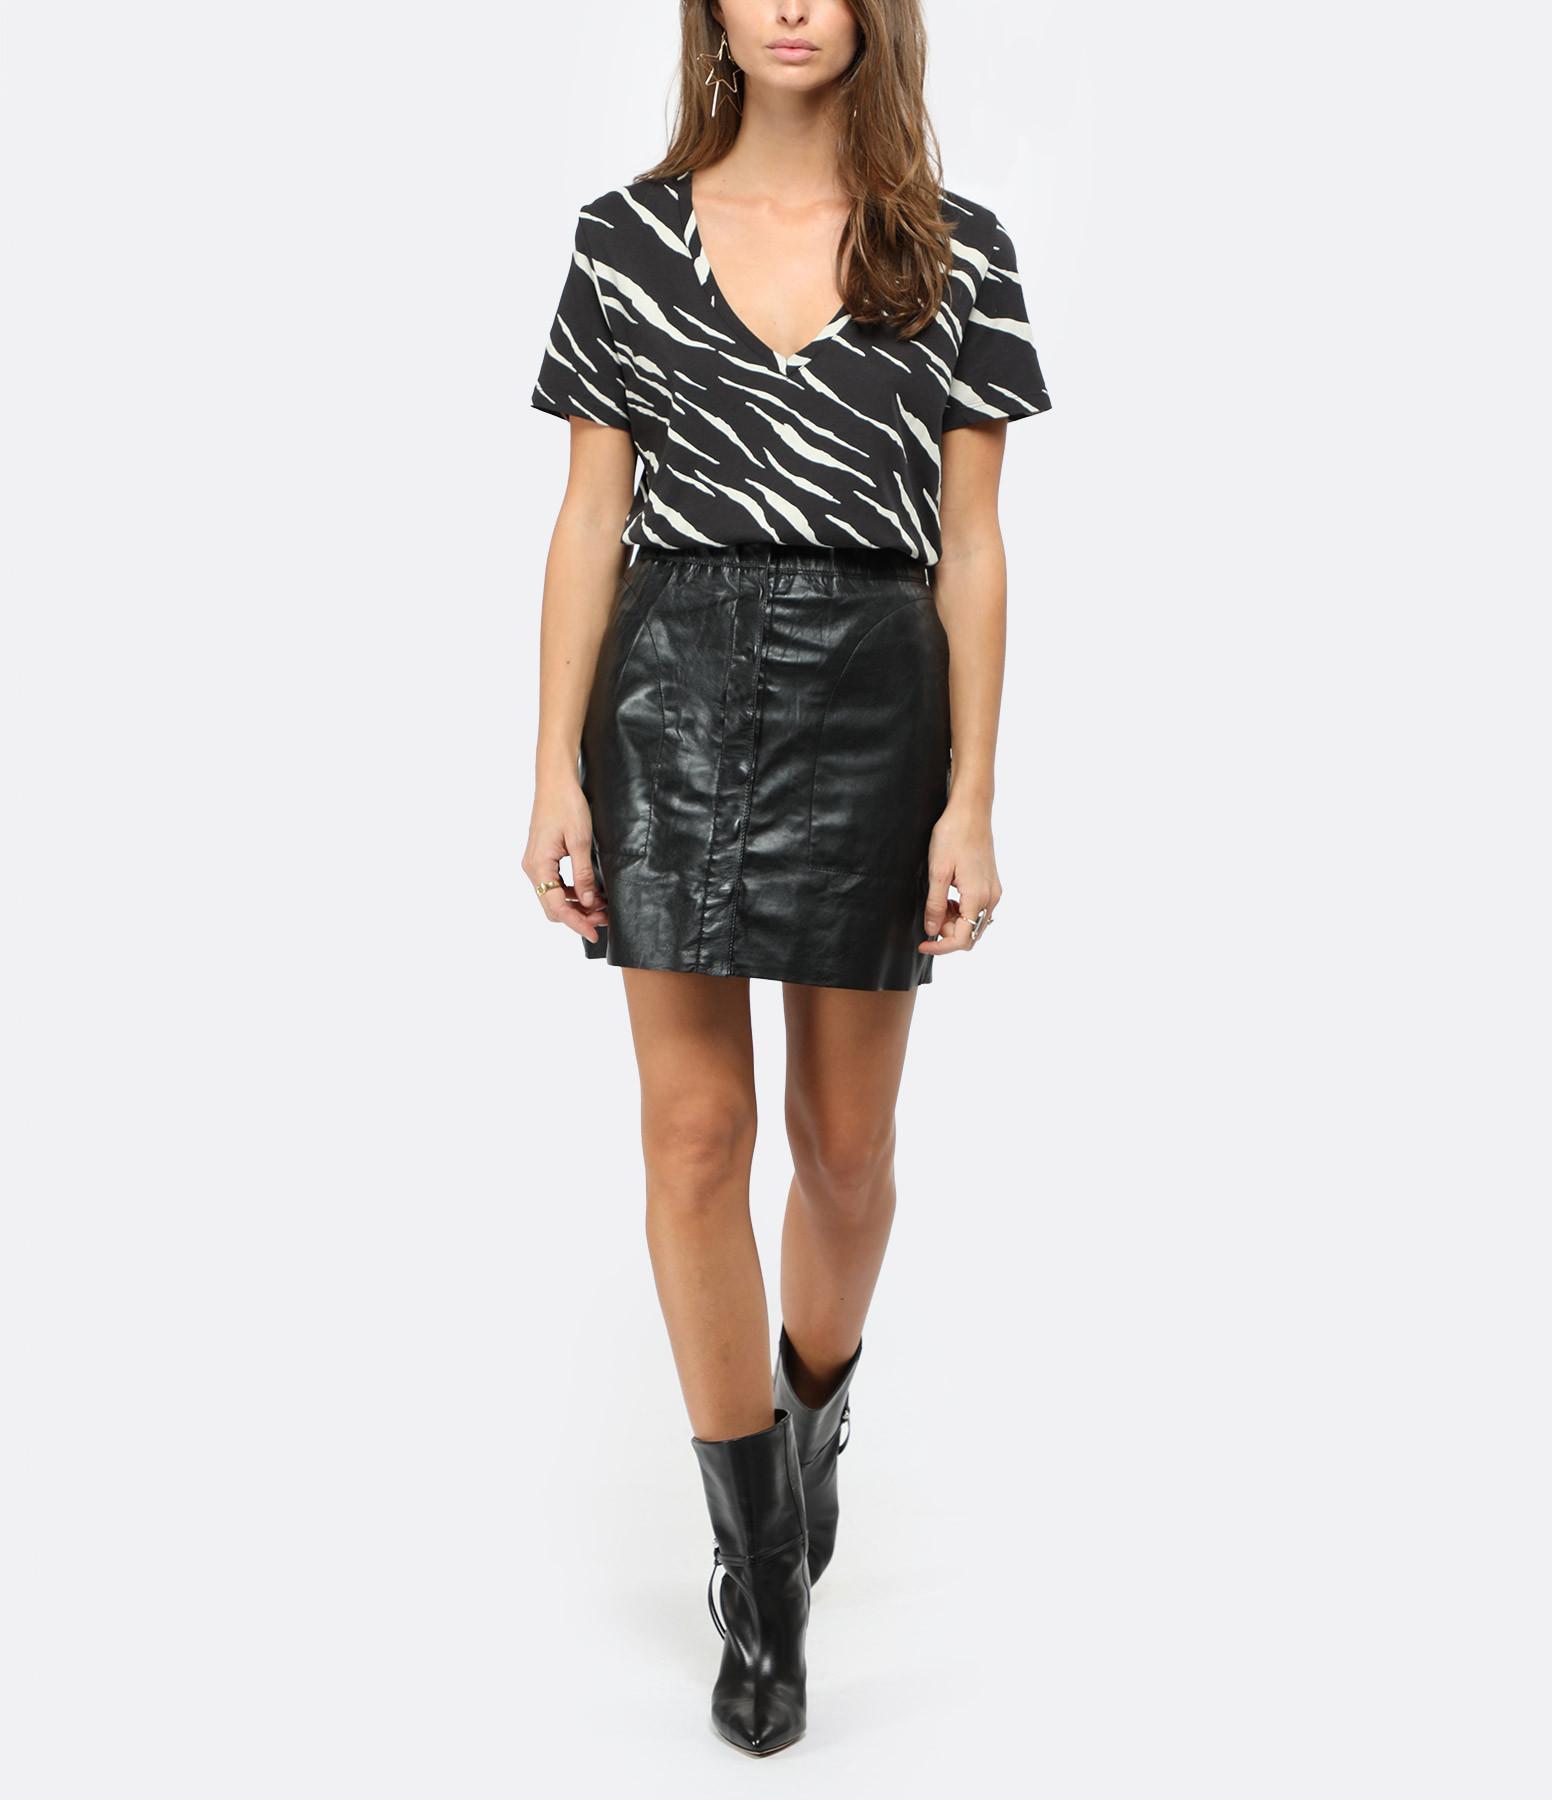 RAILS - Tee-shirt Cara Imprimé Tigre Blanc Noir